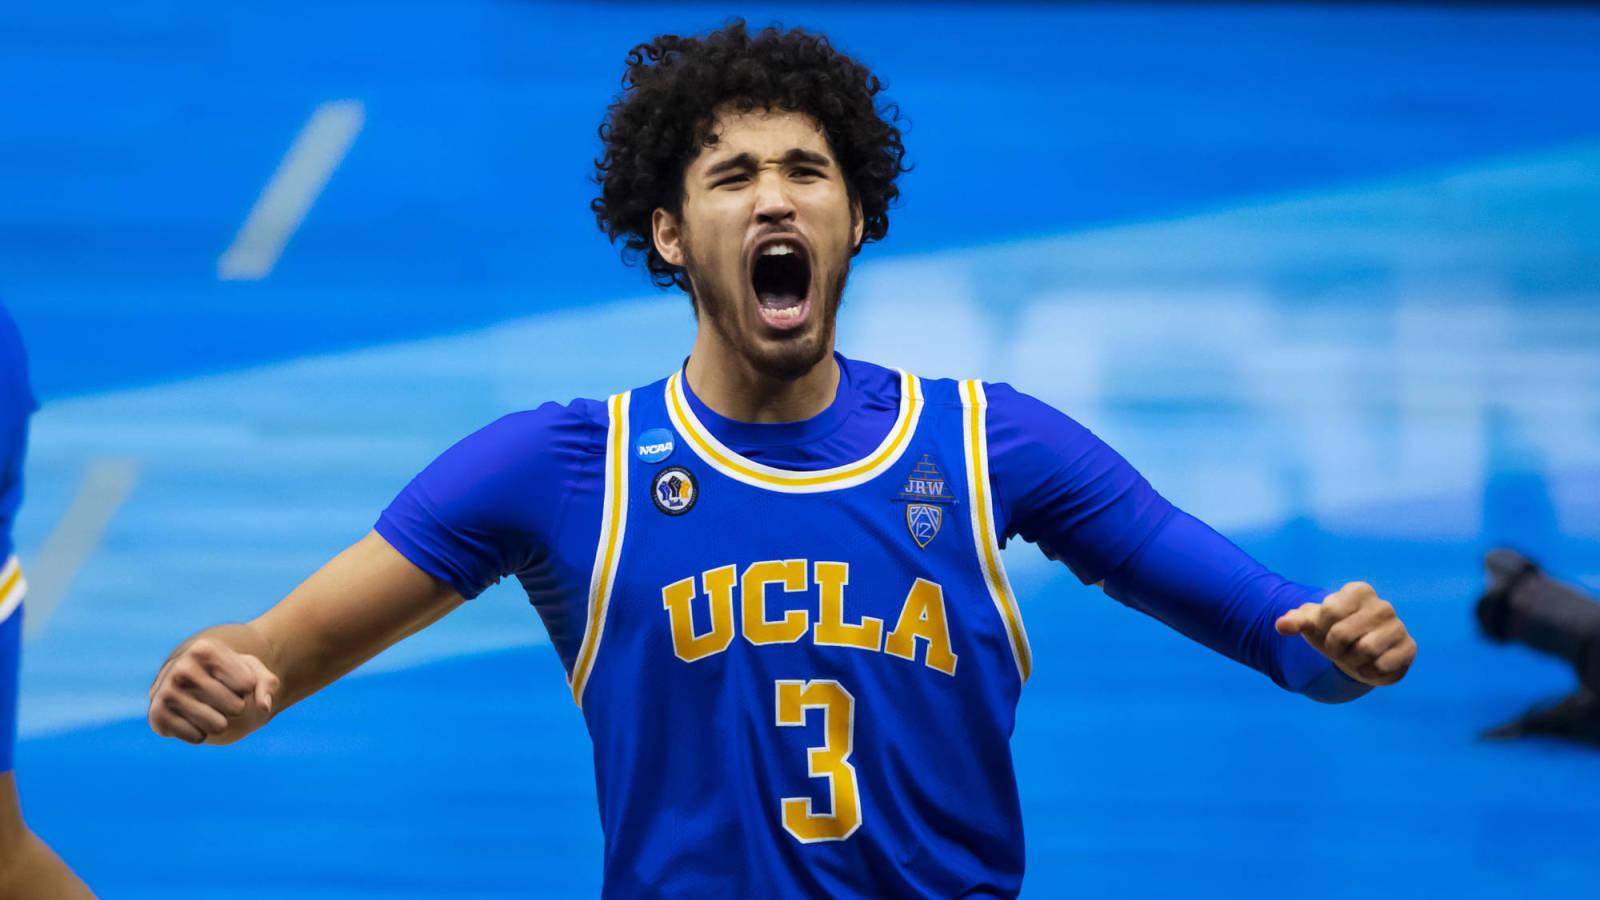 Watch: UCLA's Johnny Juzang got huge family surprise ahead of Final Four |  Yardbarker